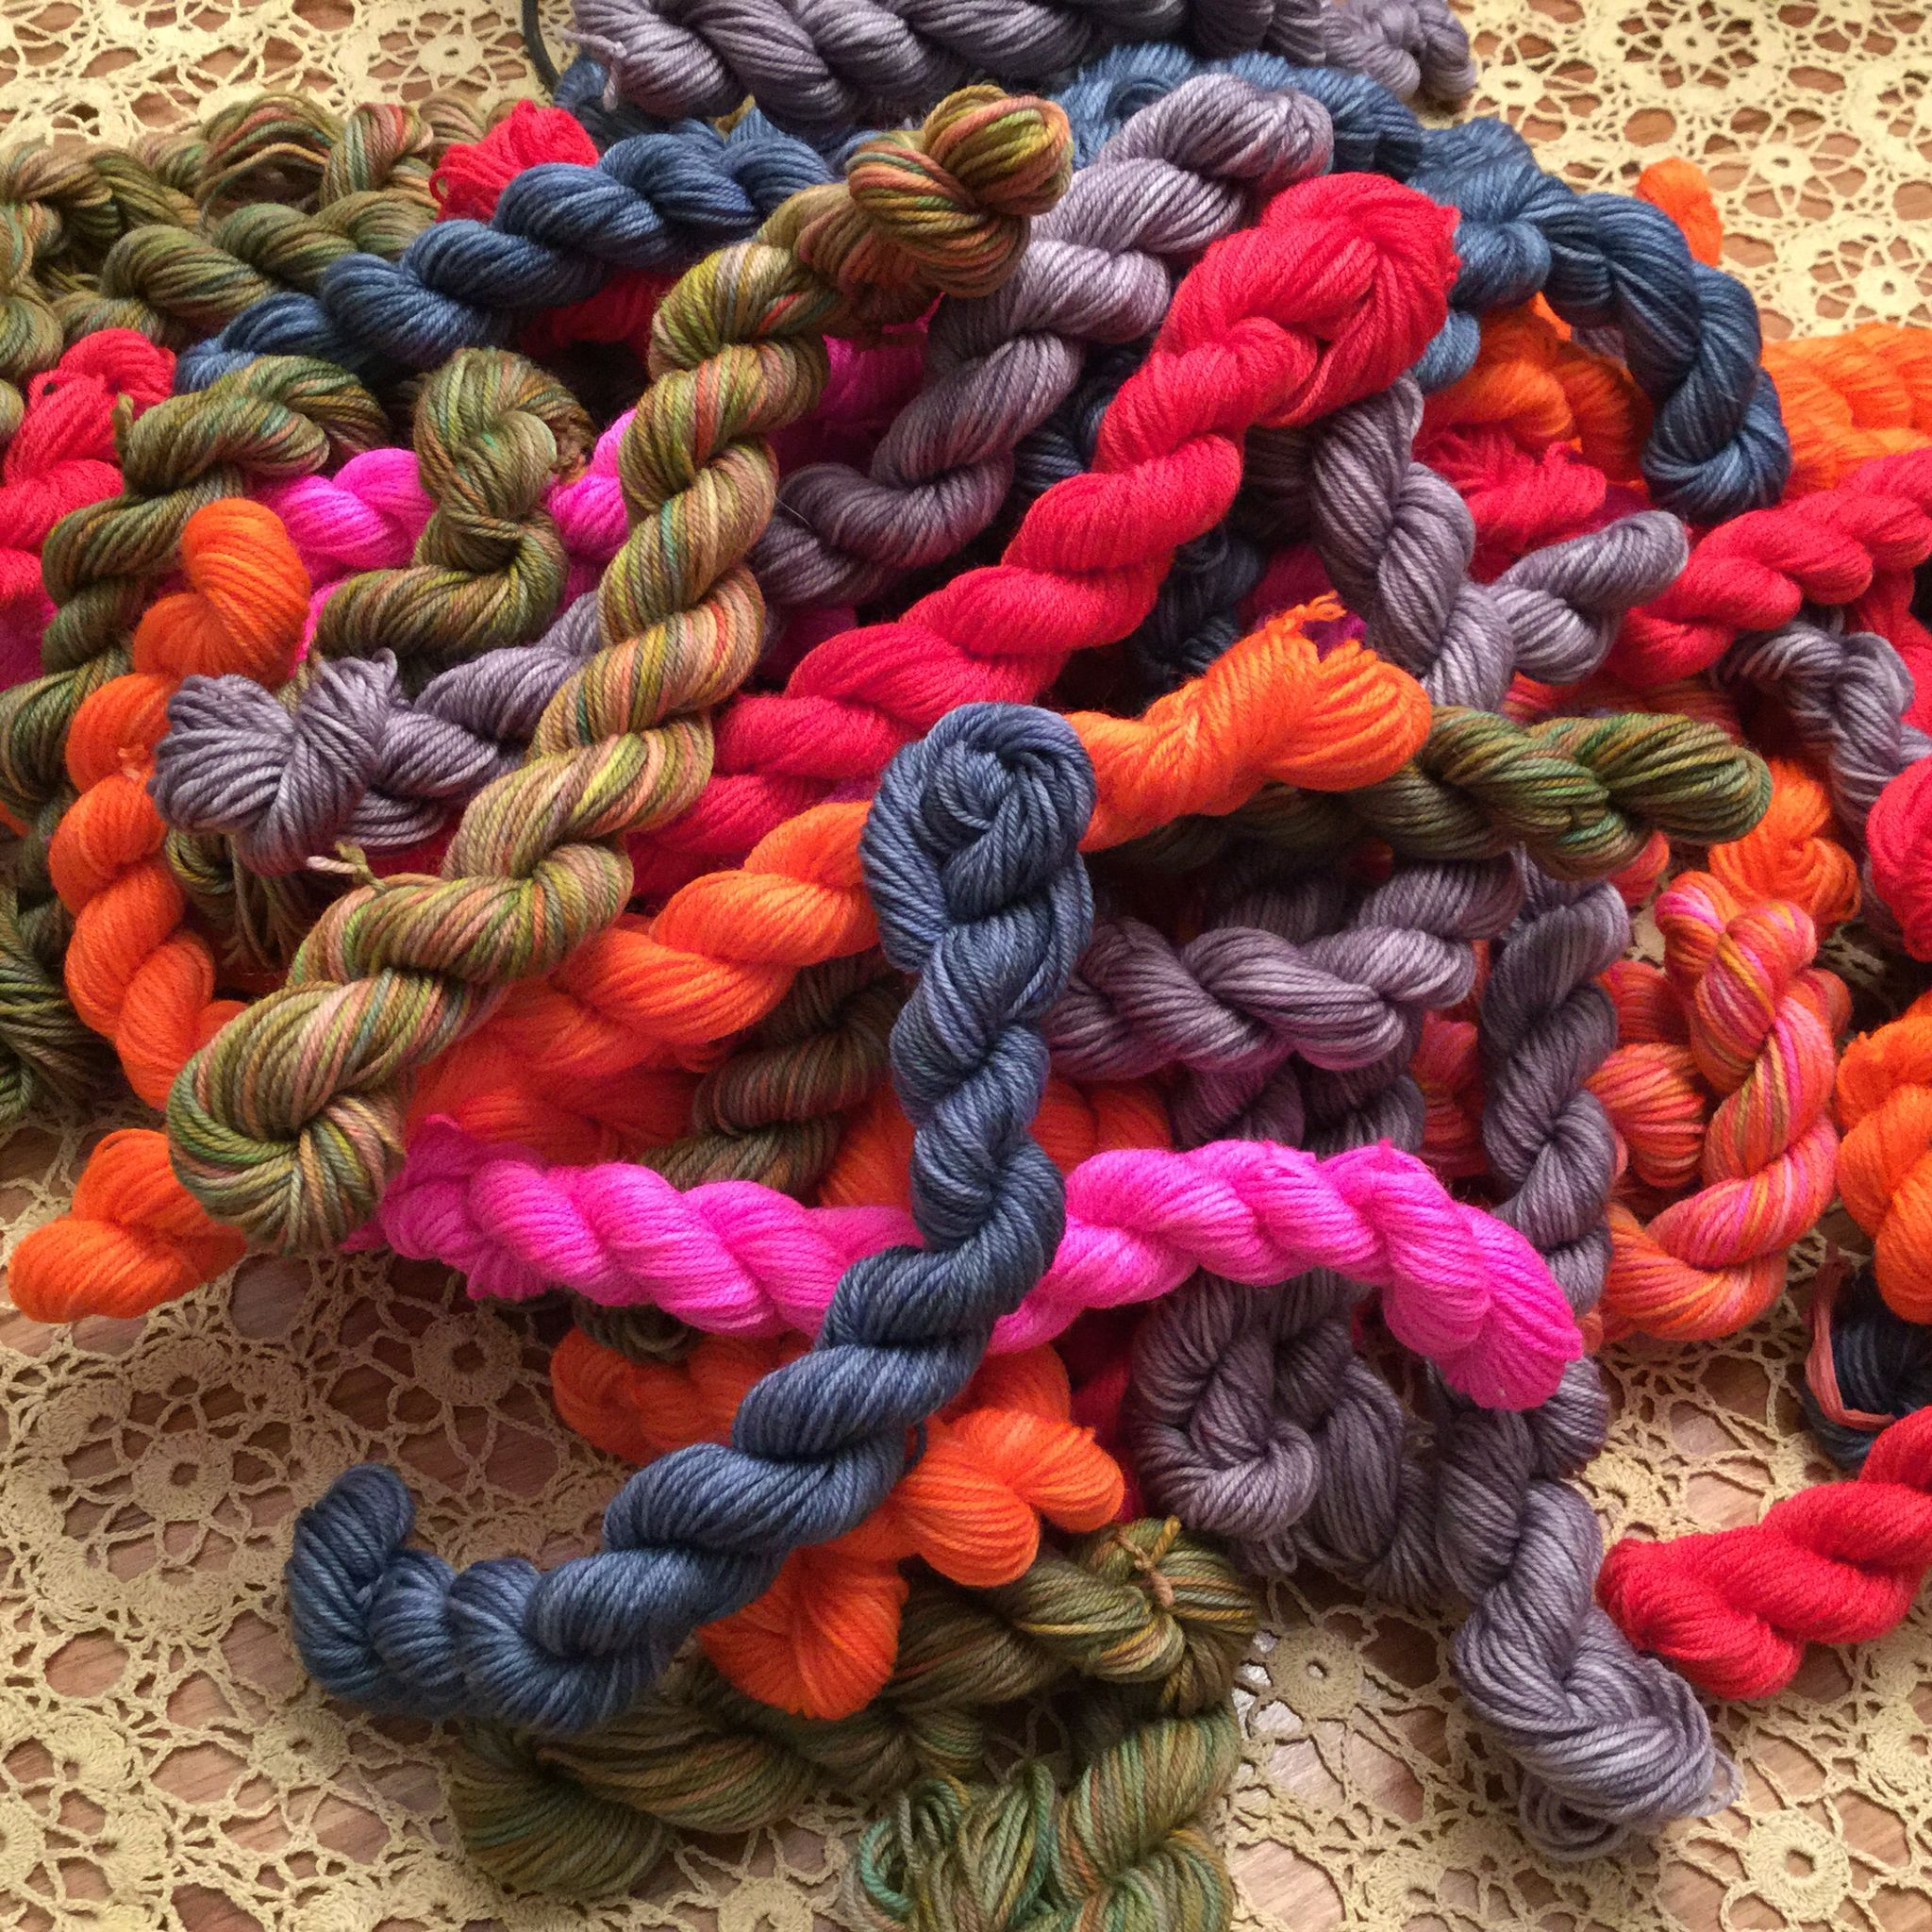 "Mr. Rutsen Studio ""C"" Twist.  Want just a taste, try a twist. This is a twist of approx. 52 yards of our ""Casey"" yarn, which is 75/25 SW Merino/Nylon 4 ply fingering Yarn. Check us out on Facebook and MtRutsenStudio.com.  #yarn #fiber #wool #merino #sheepandwool #knitting"